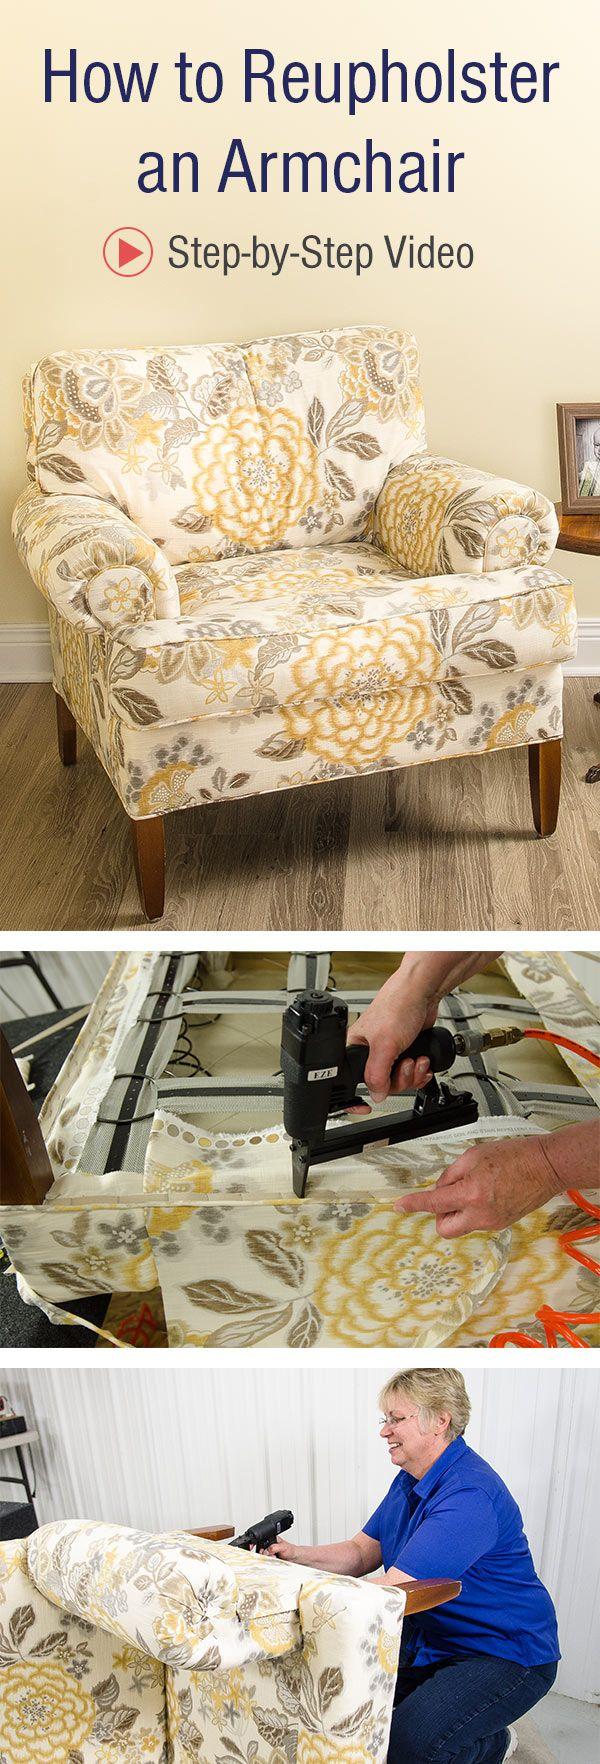 how to reupholster an armchair video pinterest fauteuils tapisserie et meubles. Black Bedroom Furniture Sets. Home Design Ideas